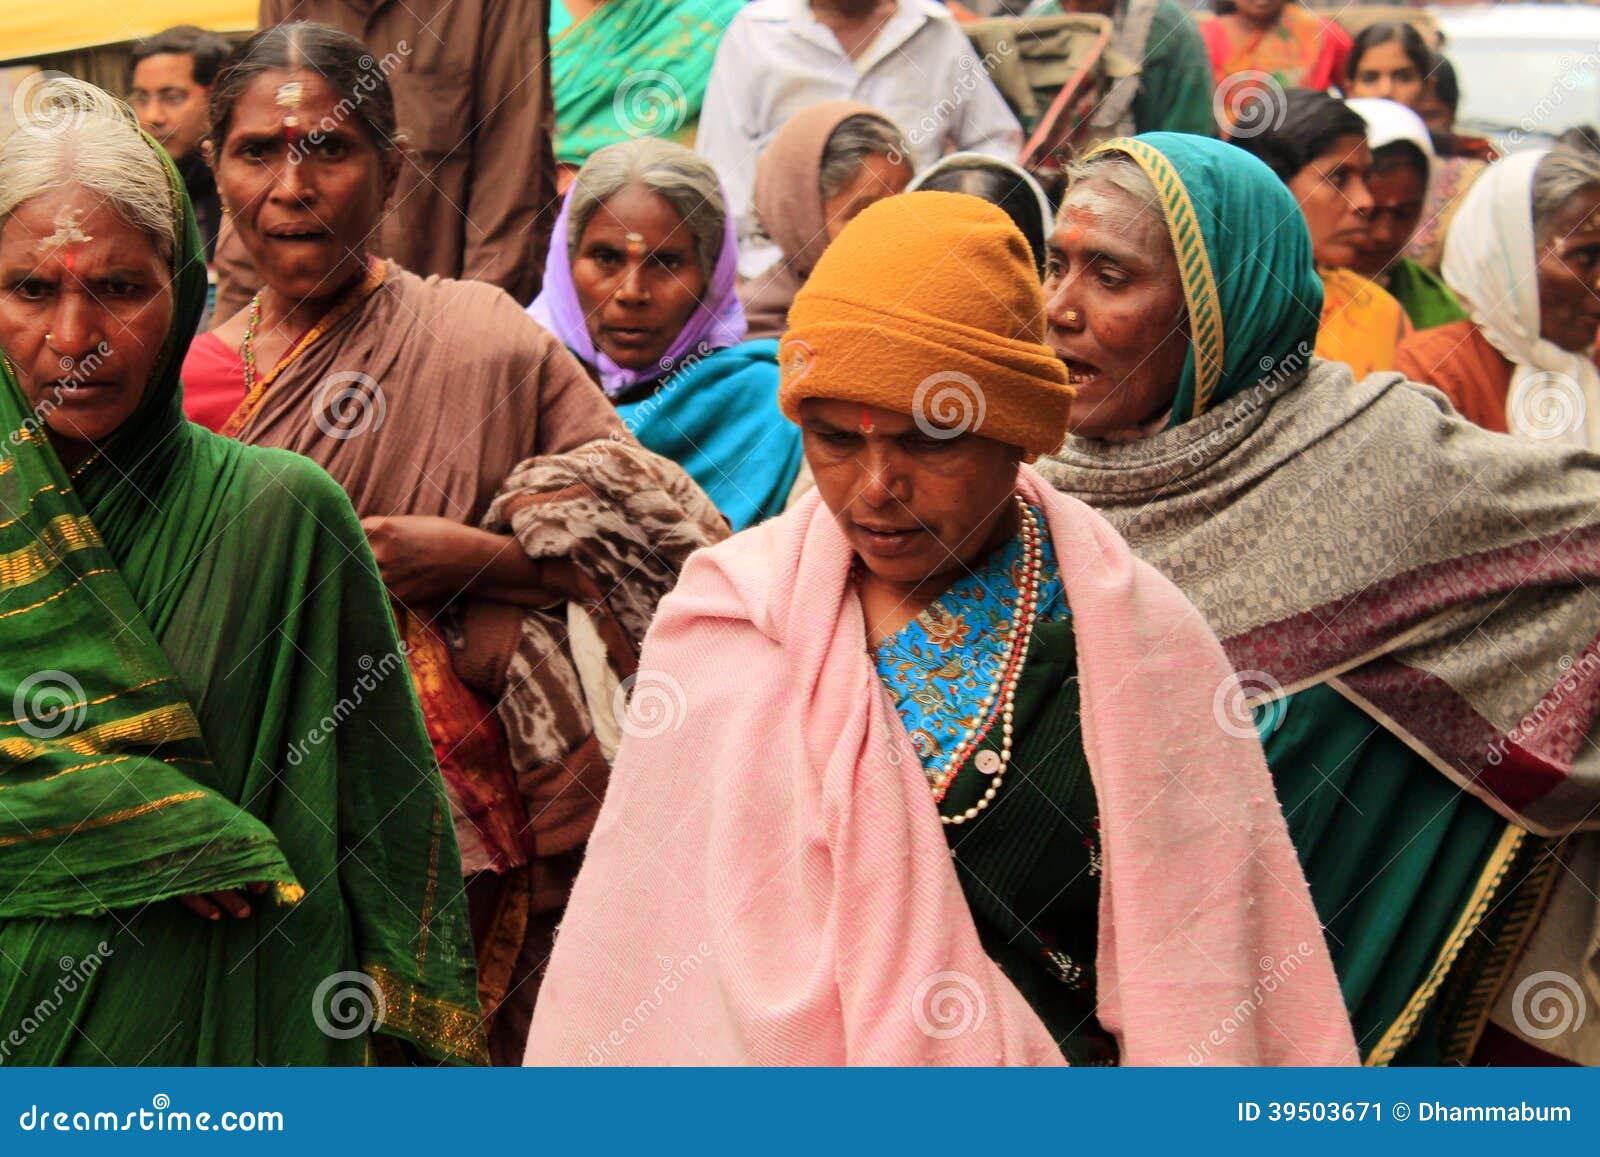 Hindu women on the indian street